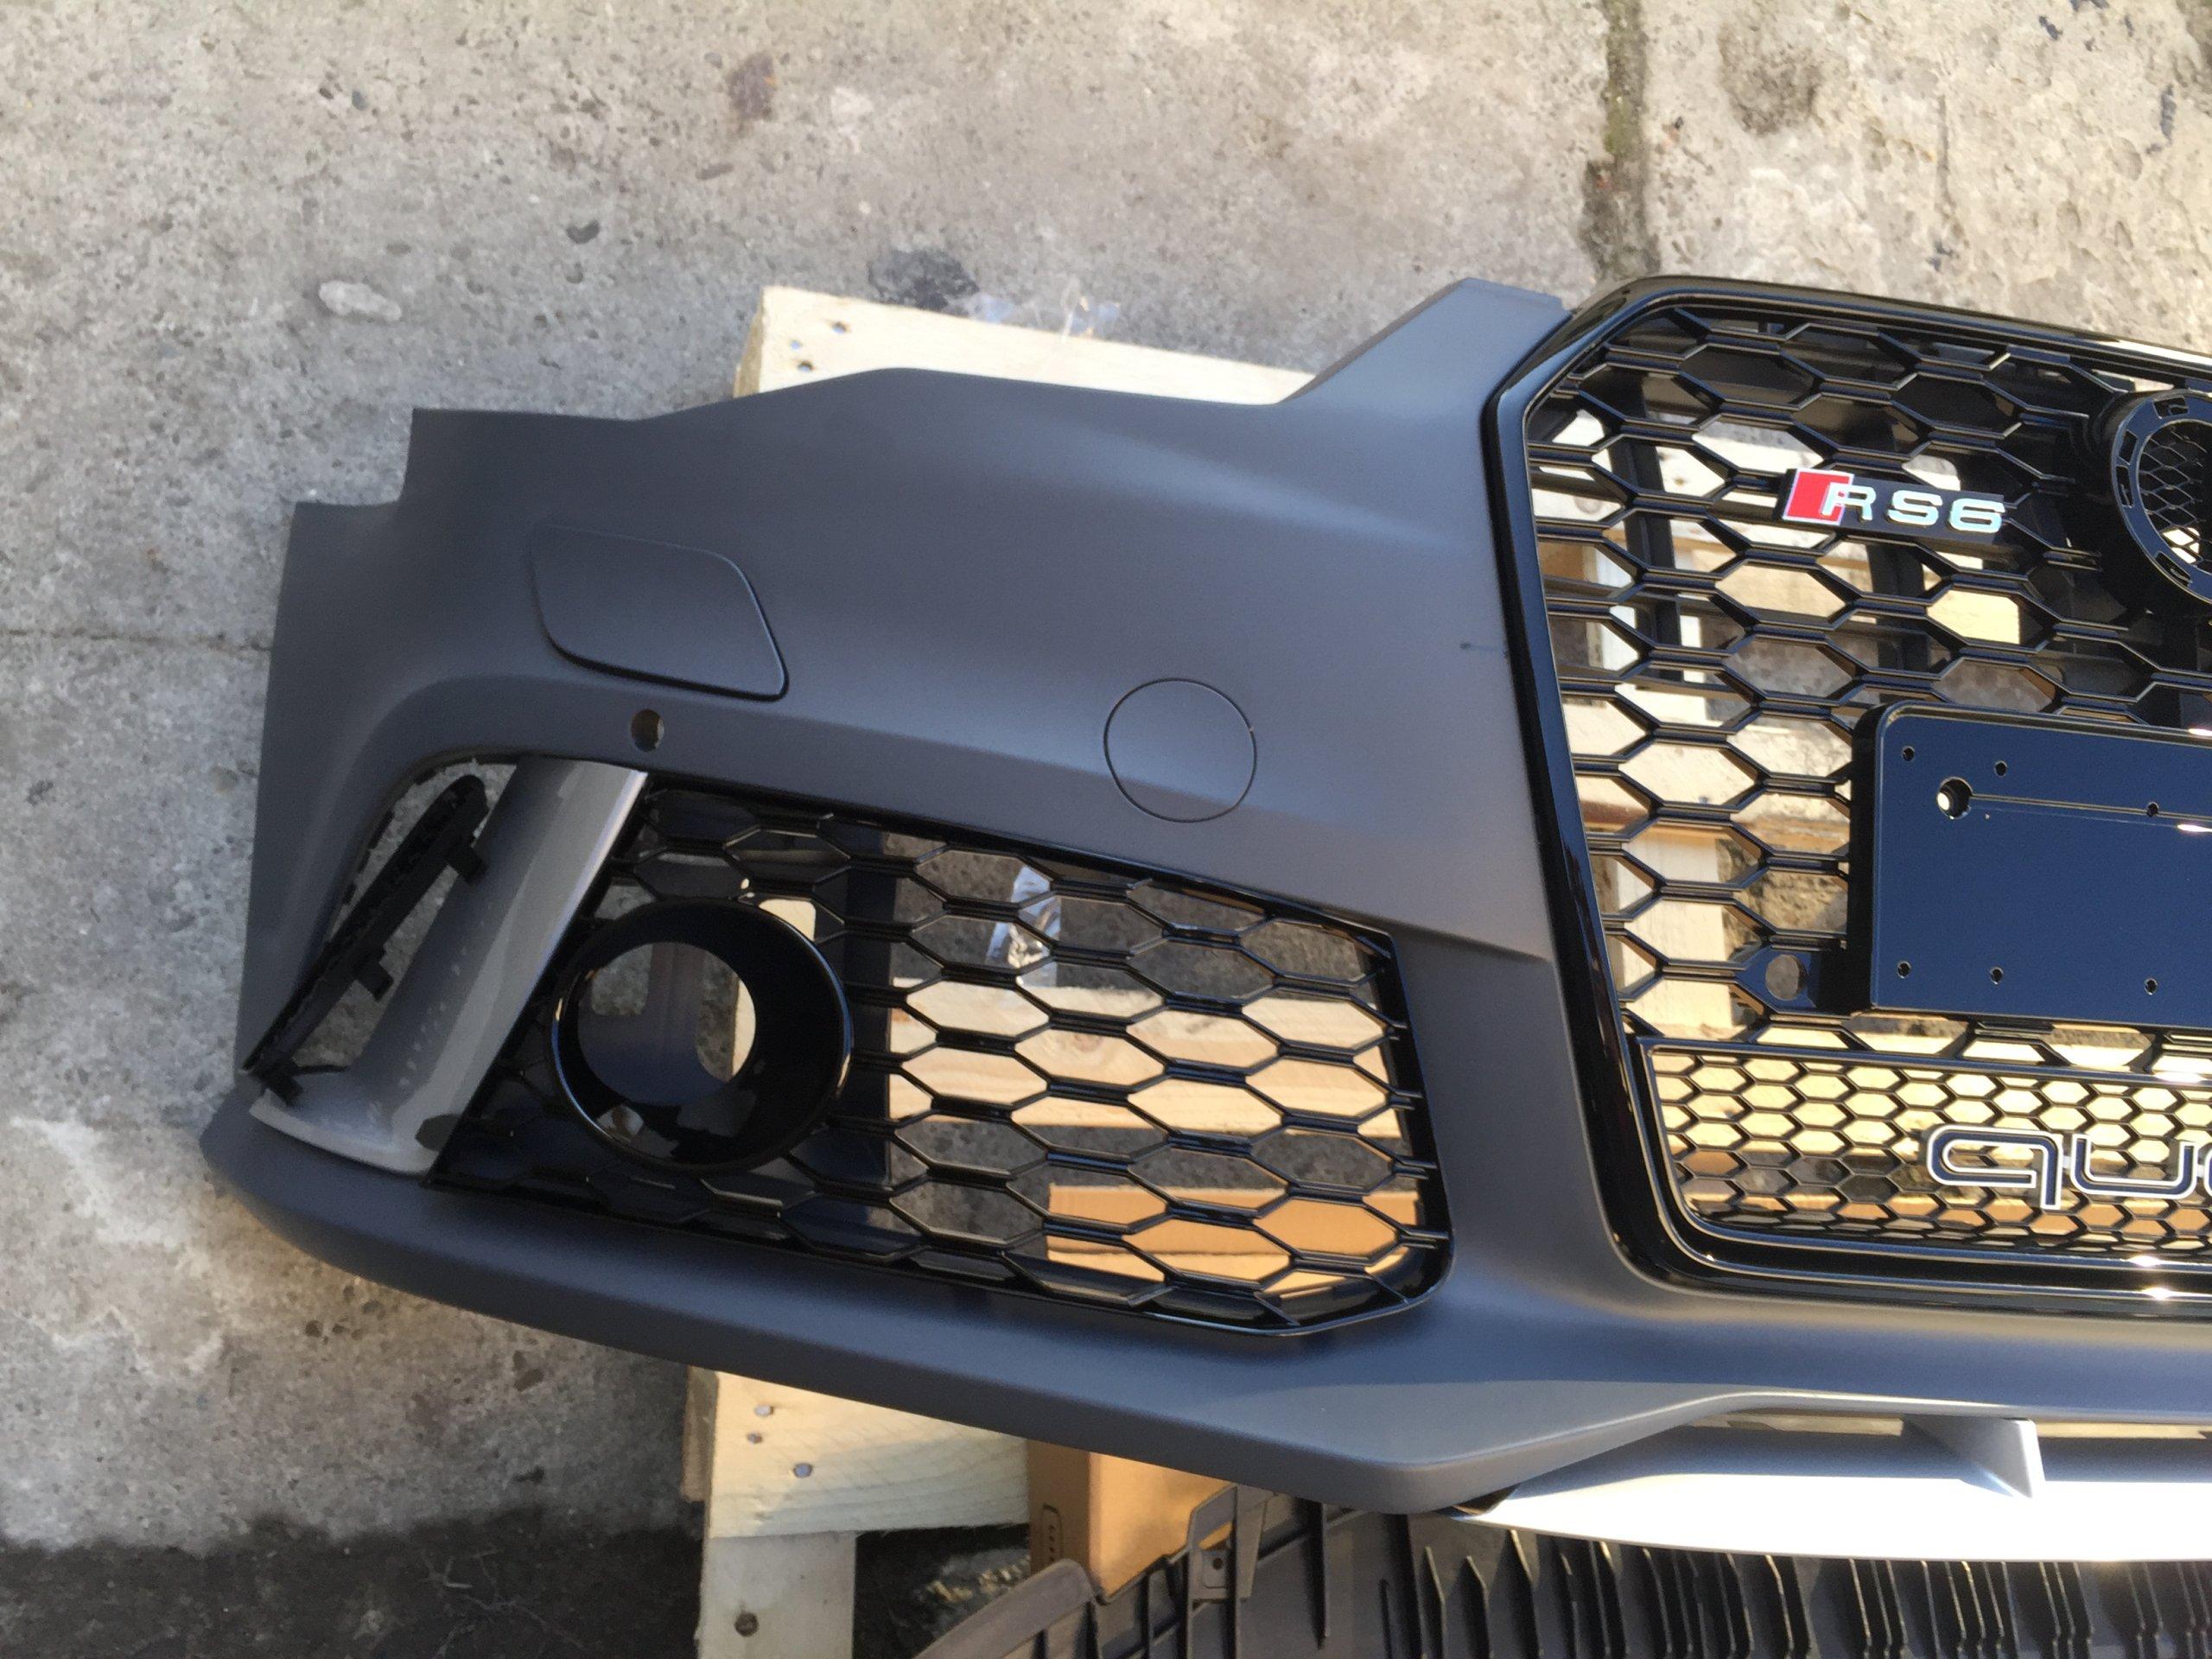 Zderzak grill Audi A6 C7 lift 2014- wzor Audi RS6